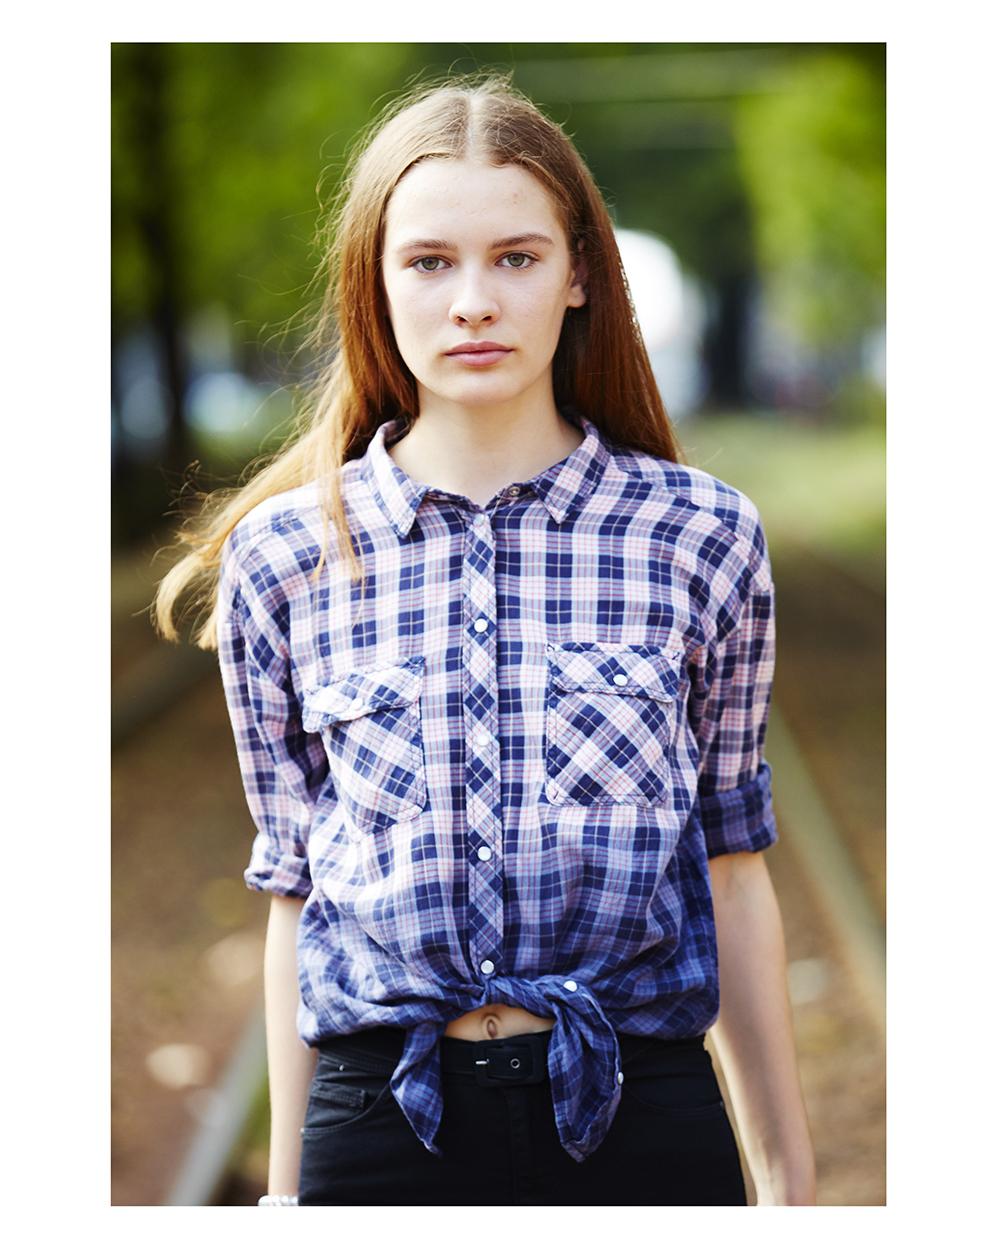 Models Sofia K Fresh Talent Management